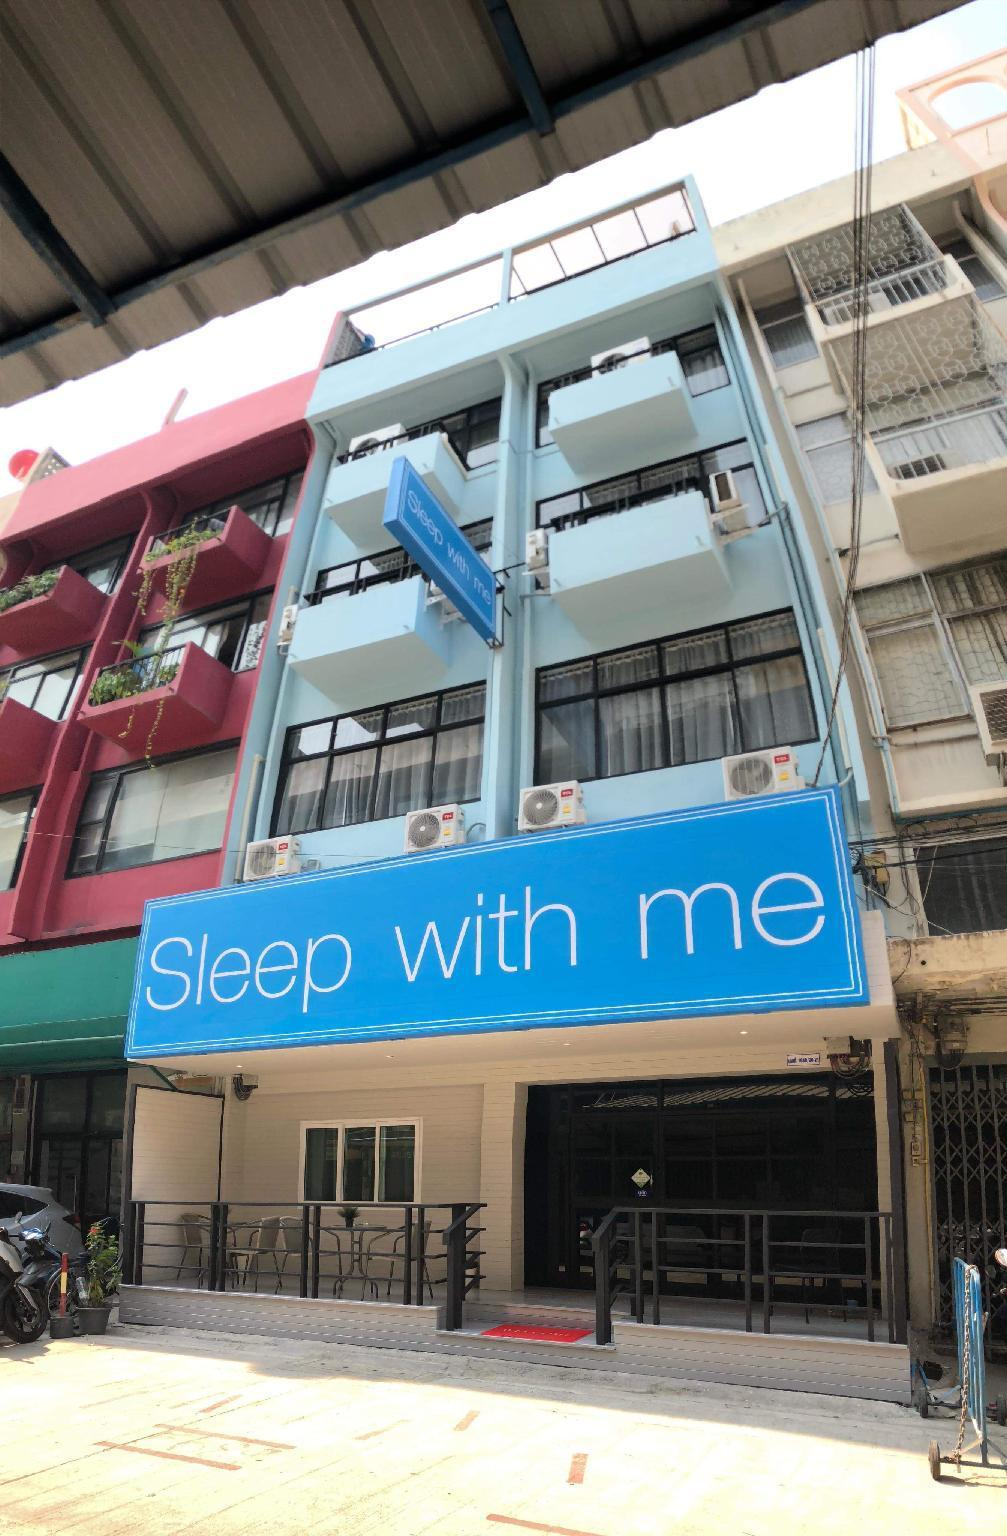 Sleep with Me Bangkok - BTS Phra Khanong สลีป วิธ มี แบงค็อก - บีทีเอส พระโขนง